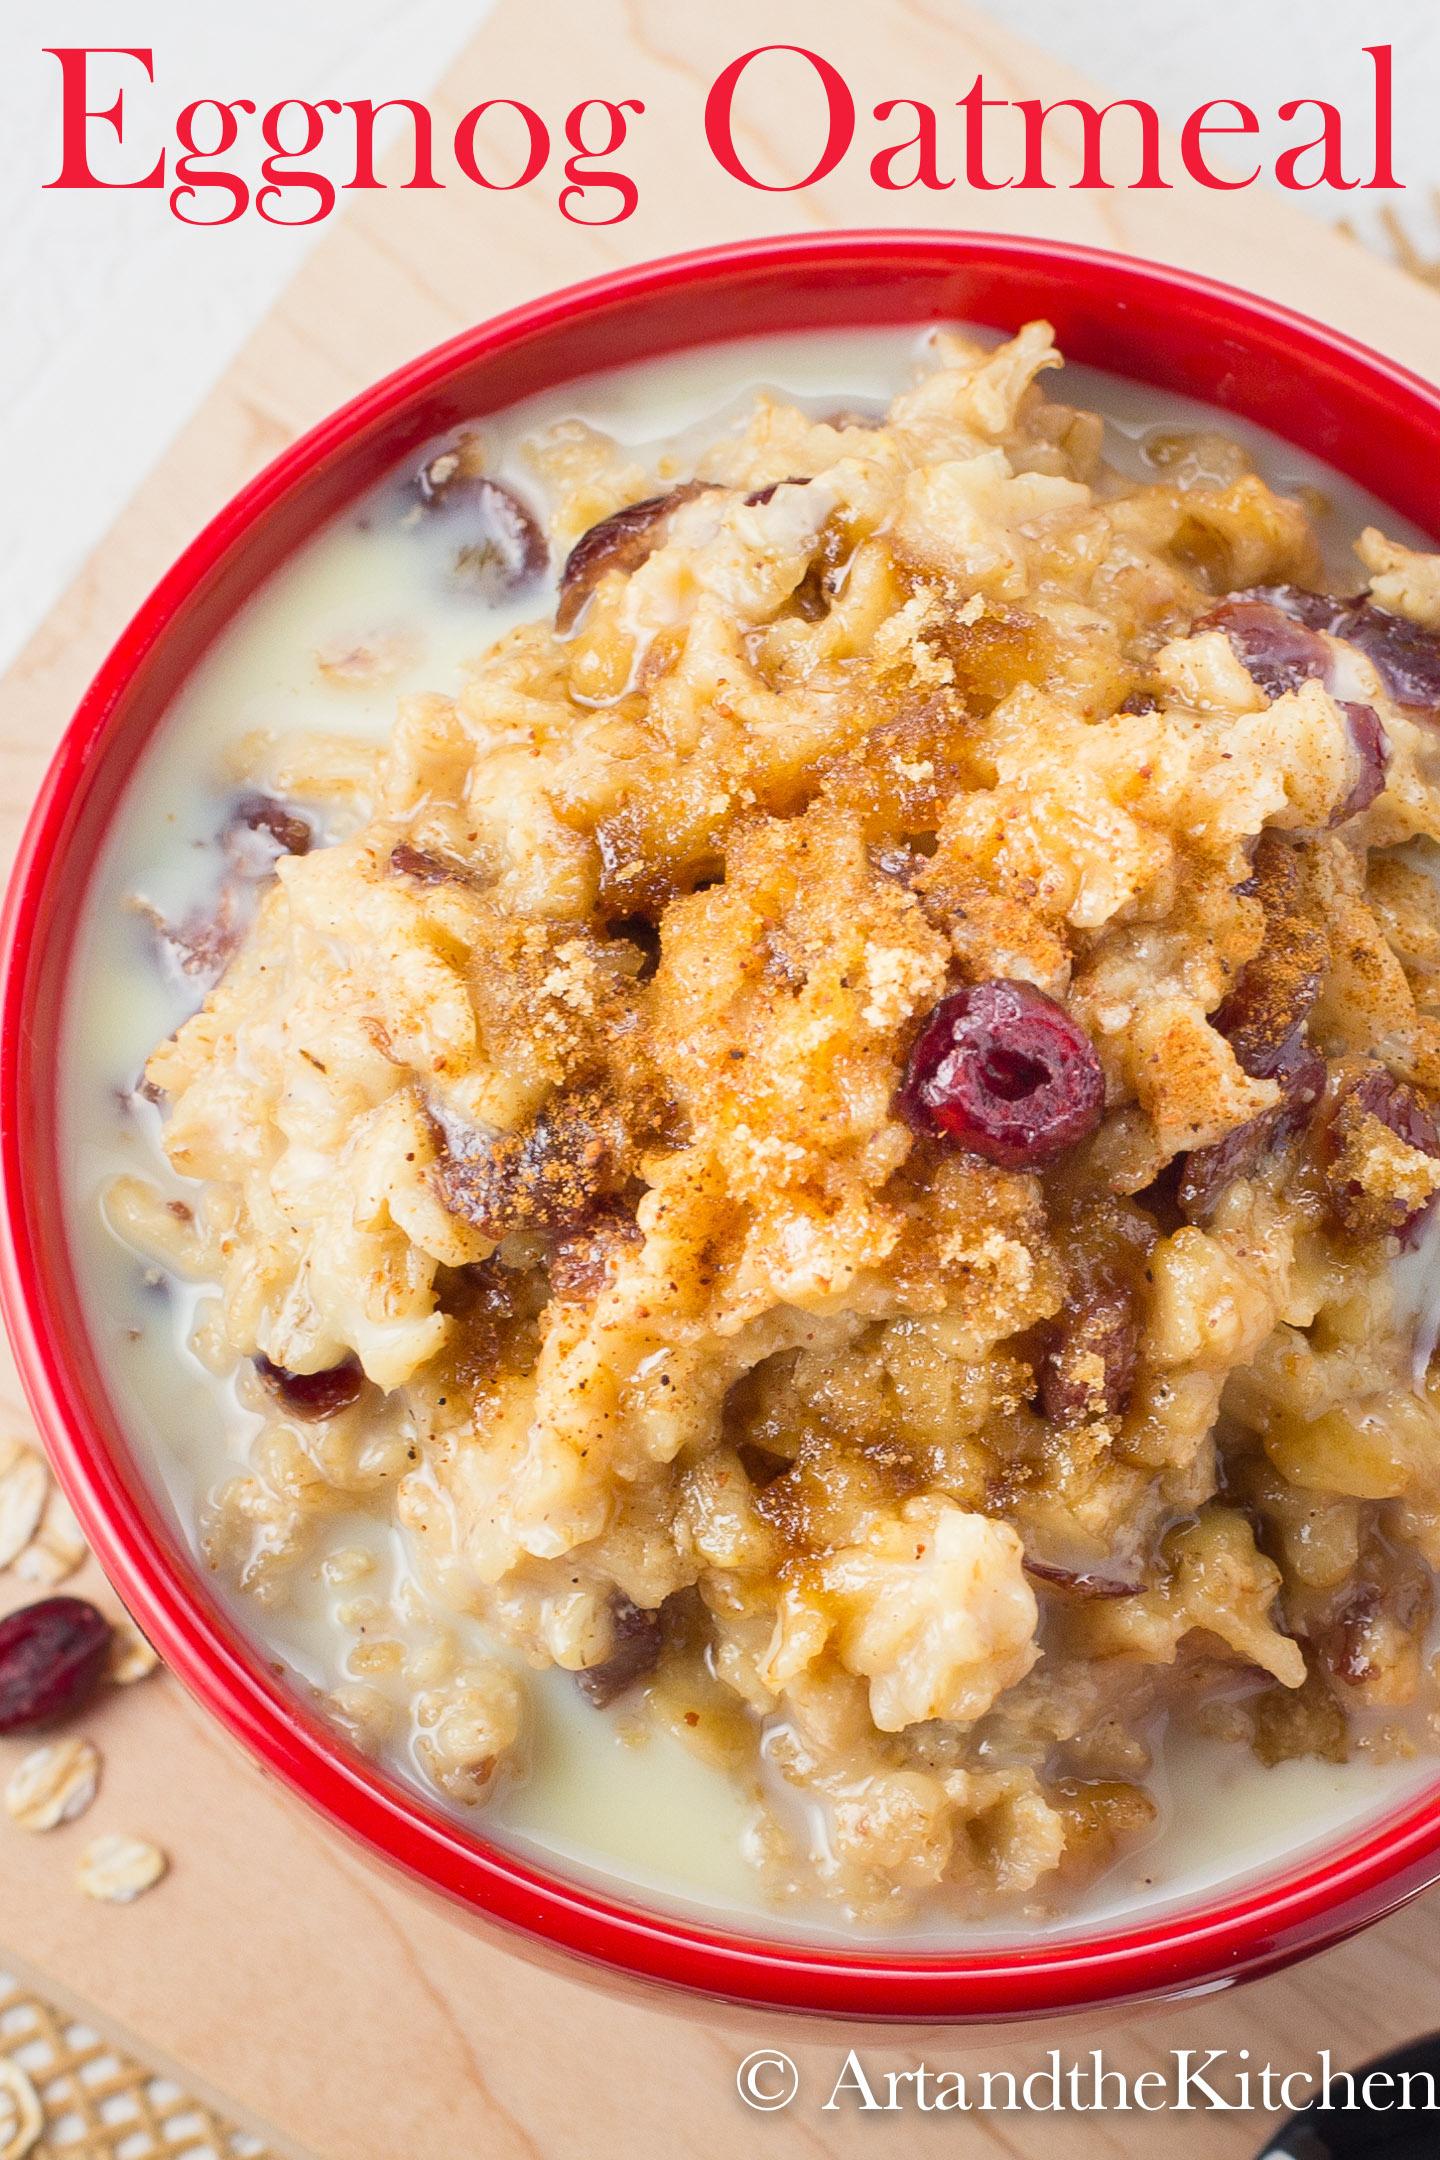 Oatmeal made with eggnog and cranberries via @artandthekitch